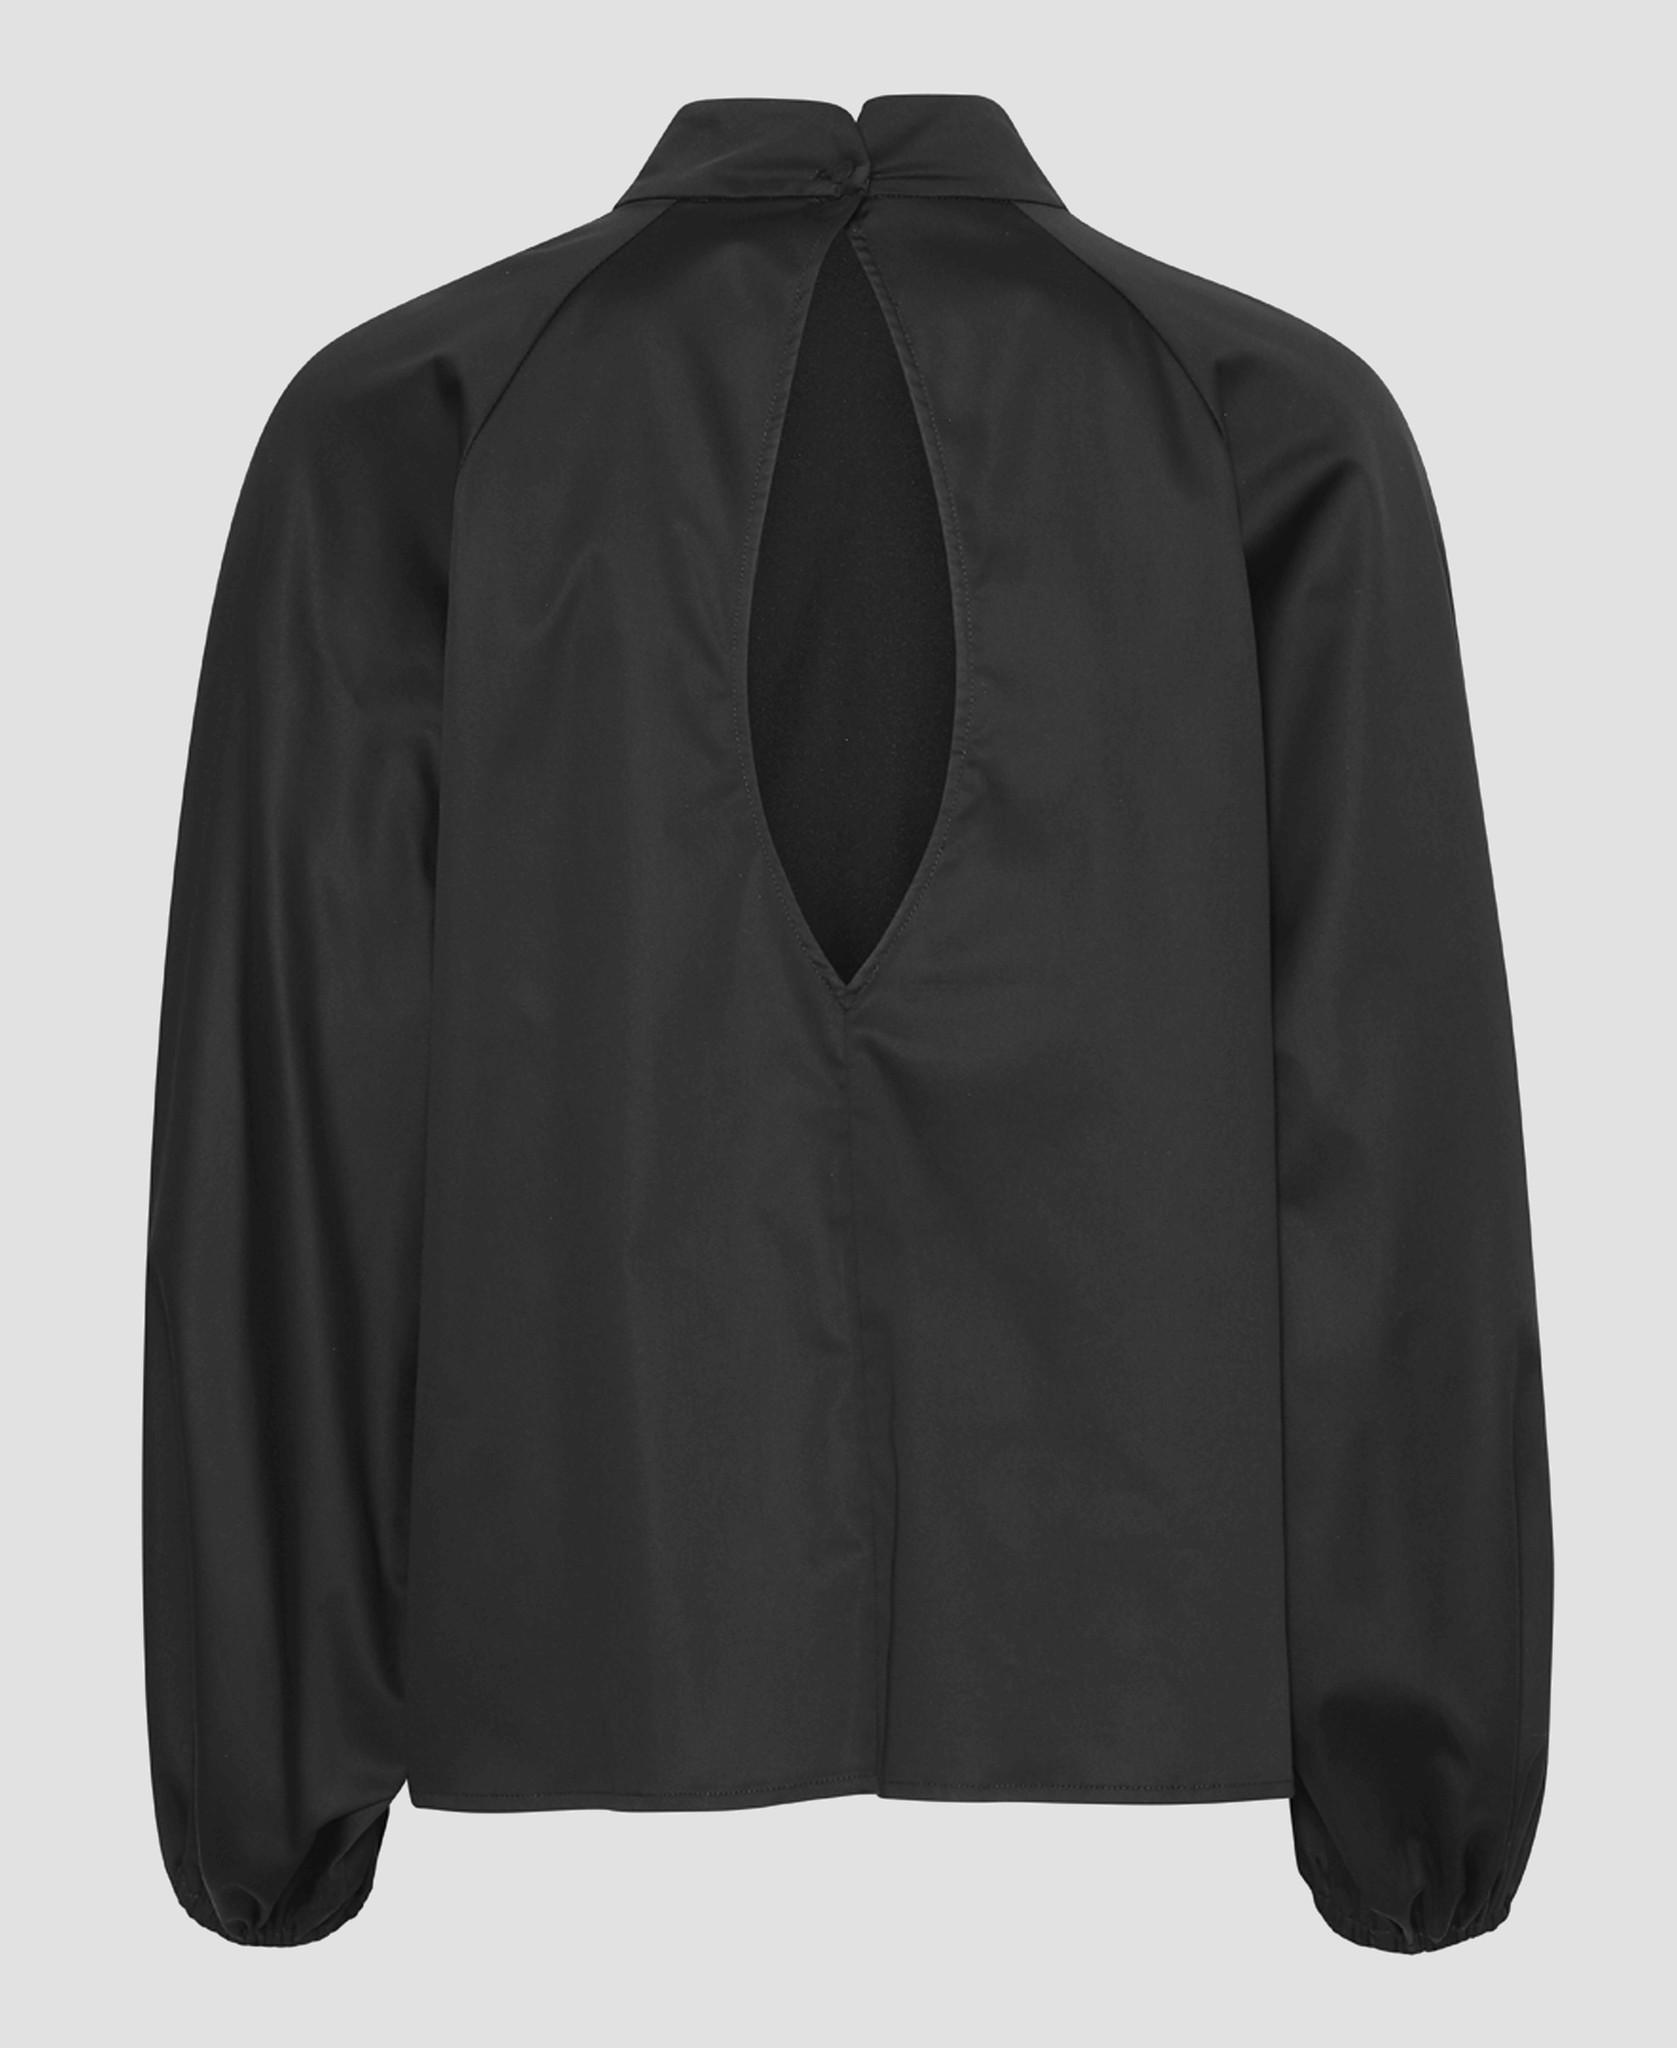 Asti blouse noir-2